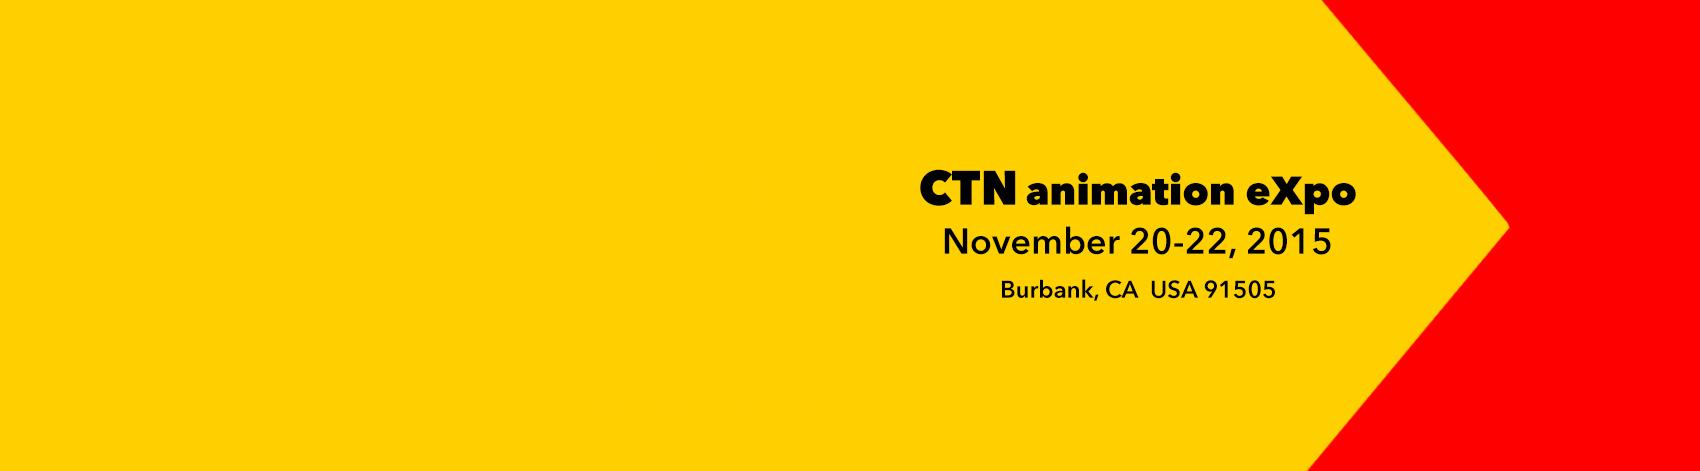 Final CTN event image